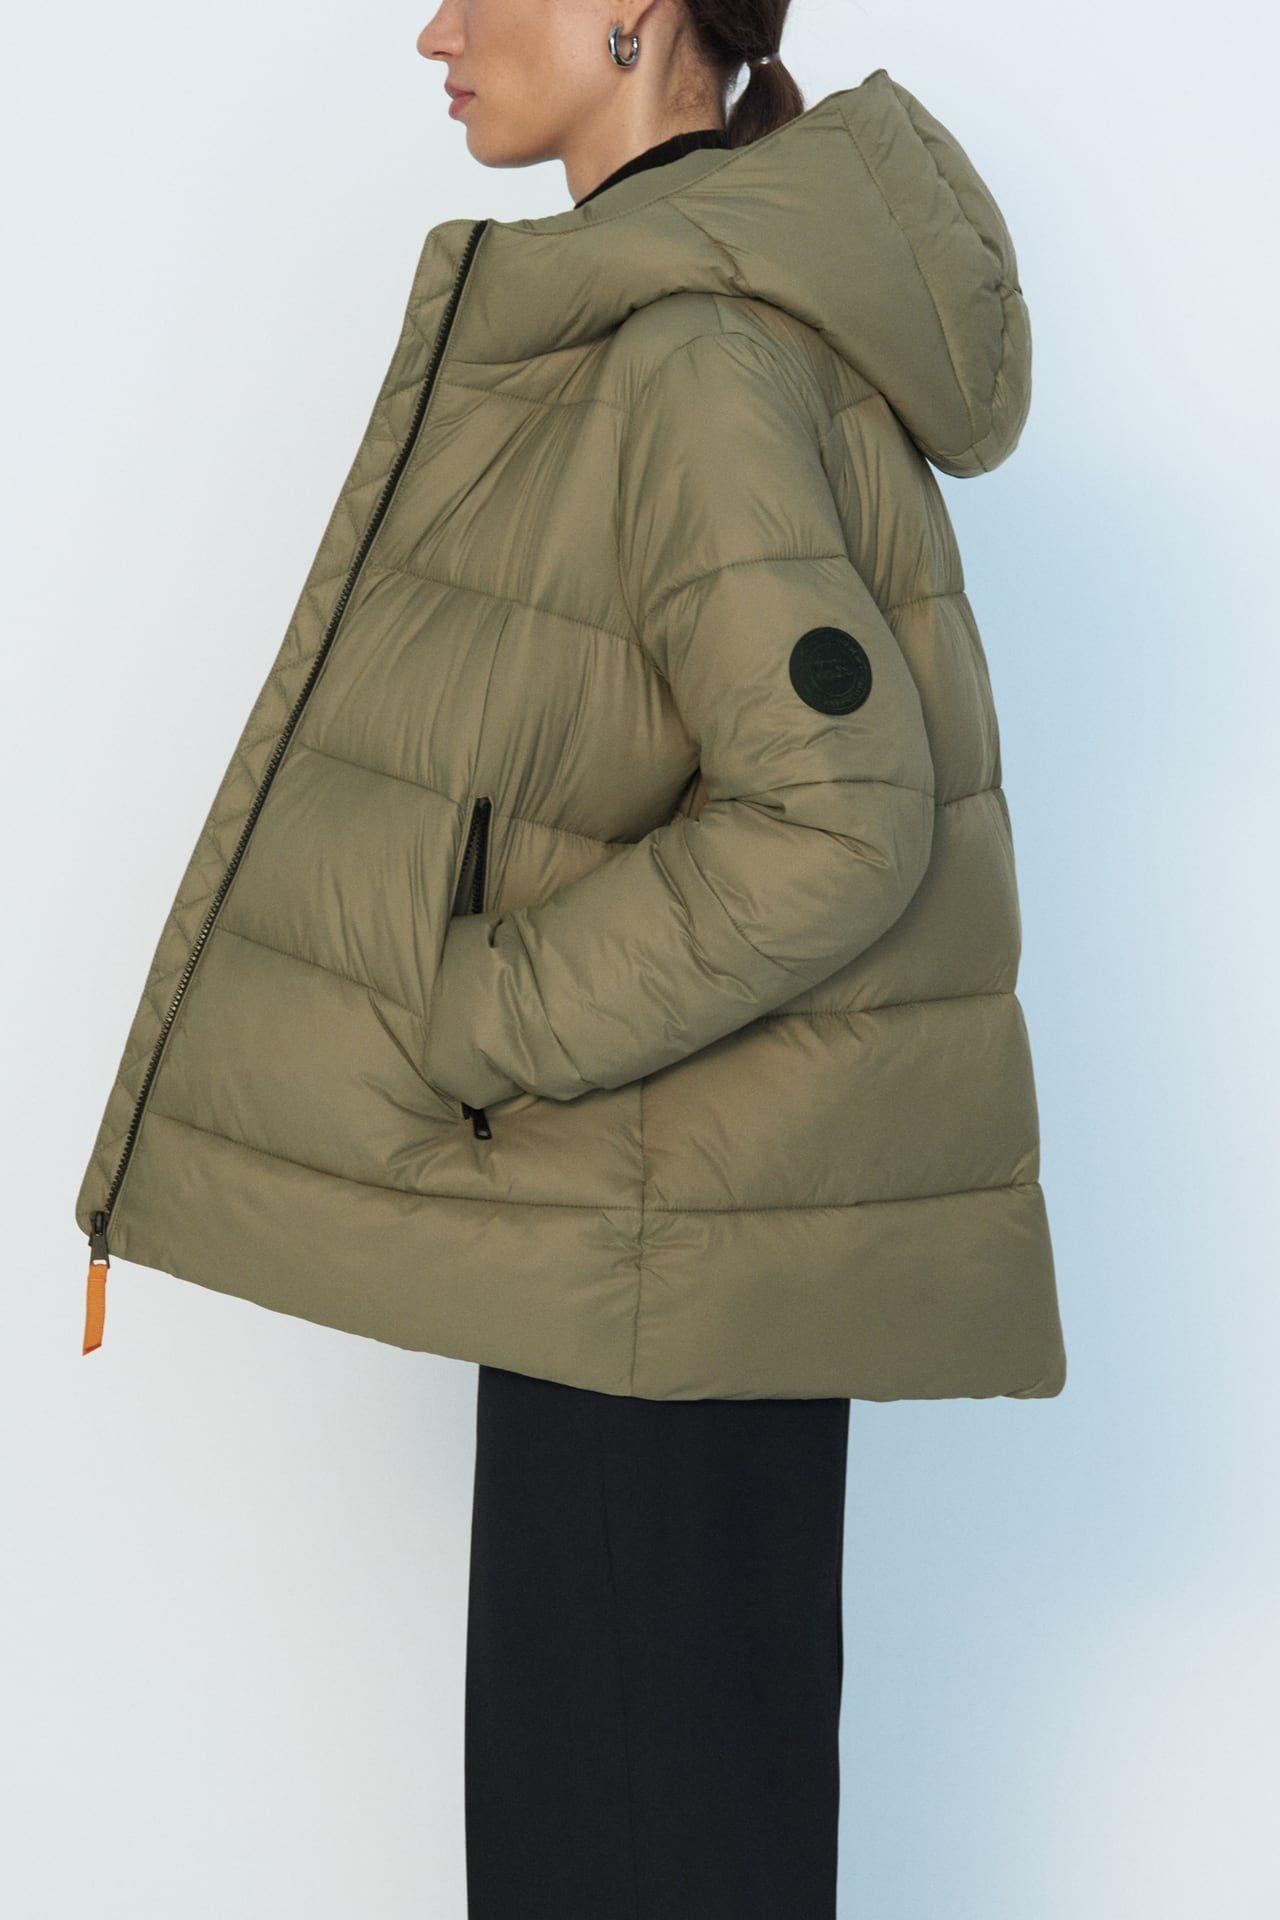 Comfortemp Thermal Insulation Puffer Jacket Zara Canada Puffer Jacket Women Puffer Jackets Puffer [ 1920 x 1280 Pixel ]